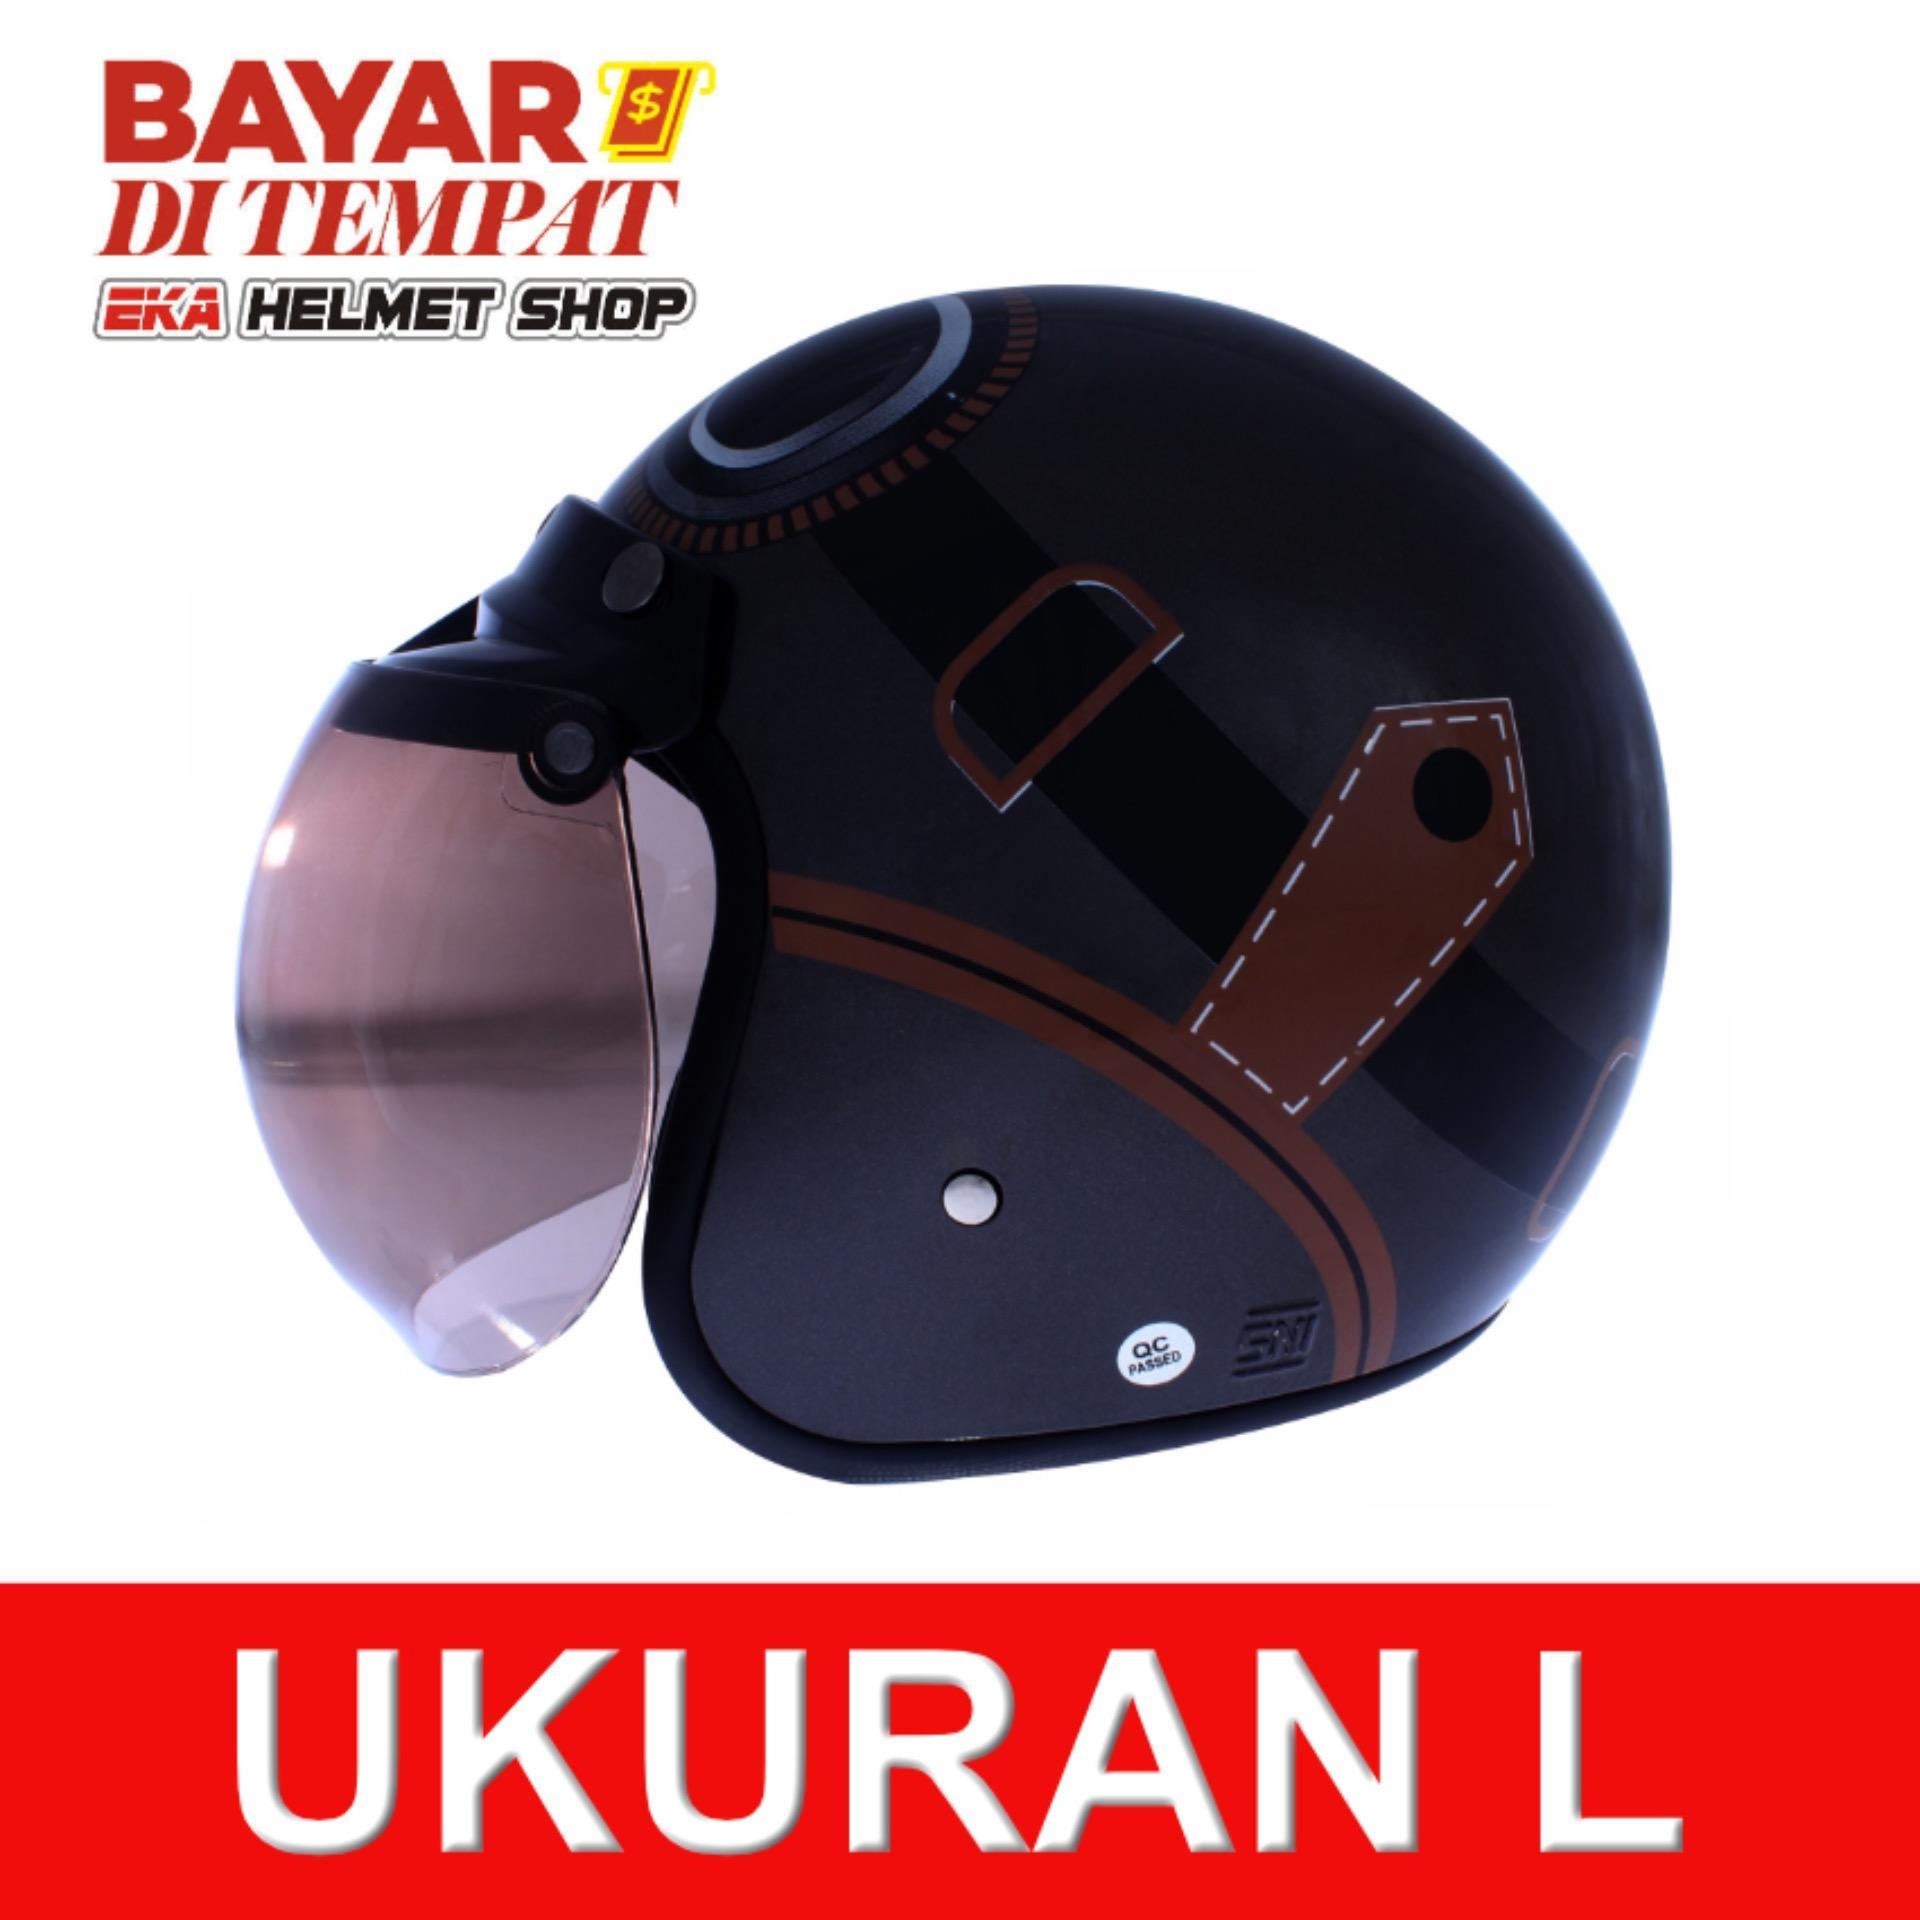 Diskon Wto Helmet Retro K3 Kacamata Abu Abu Cokelat